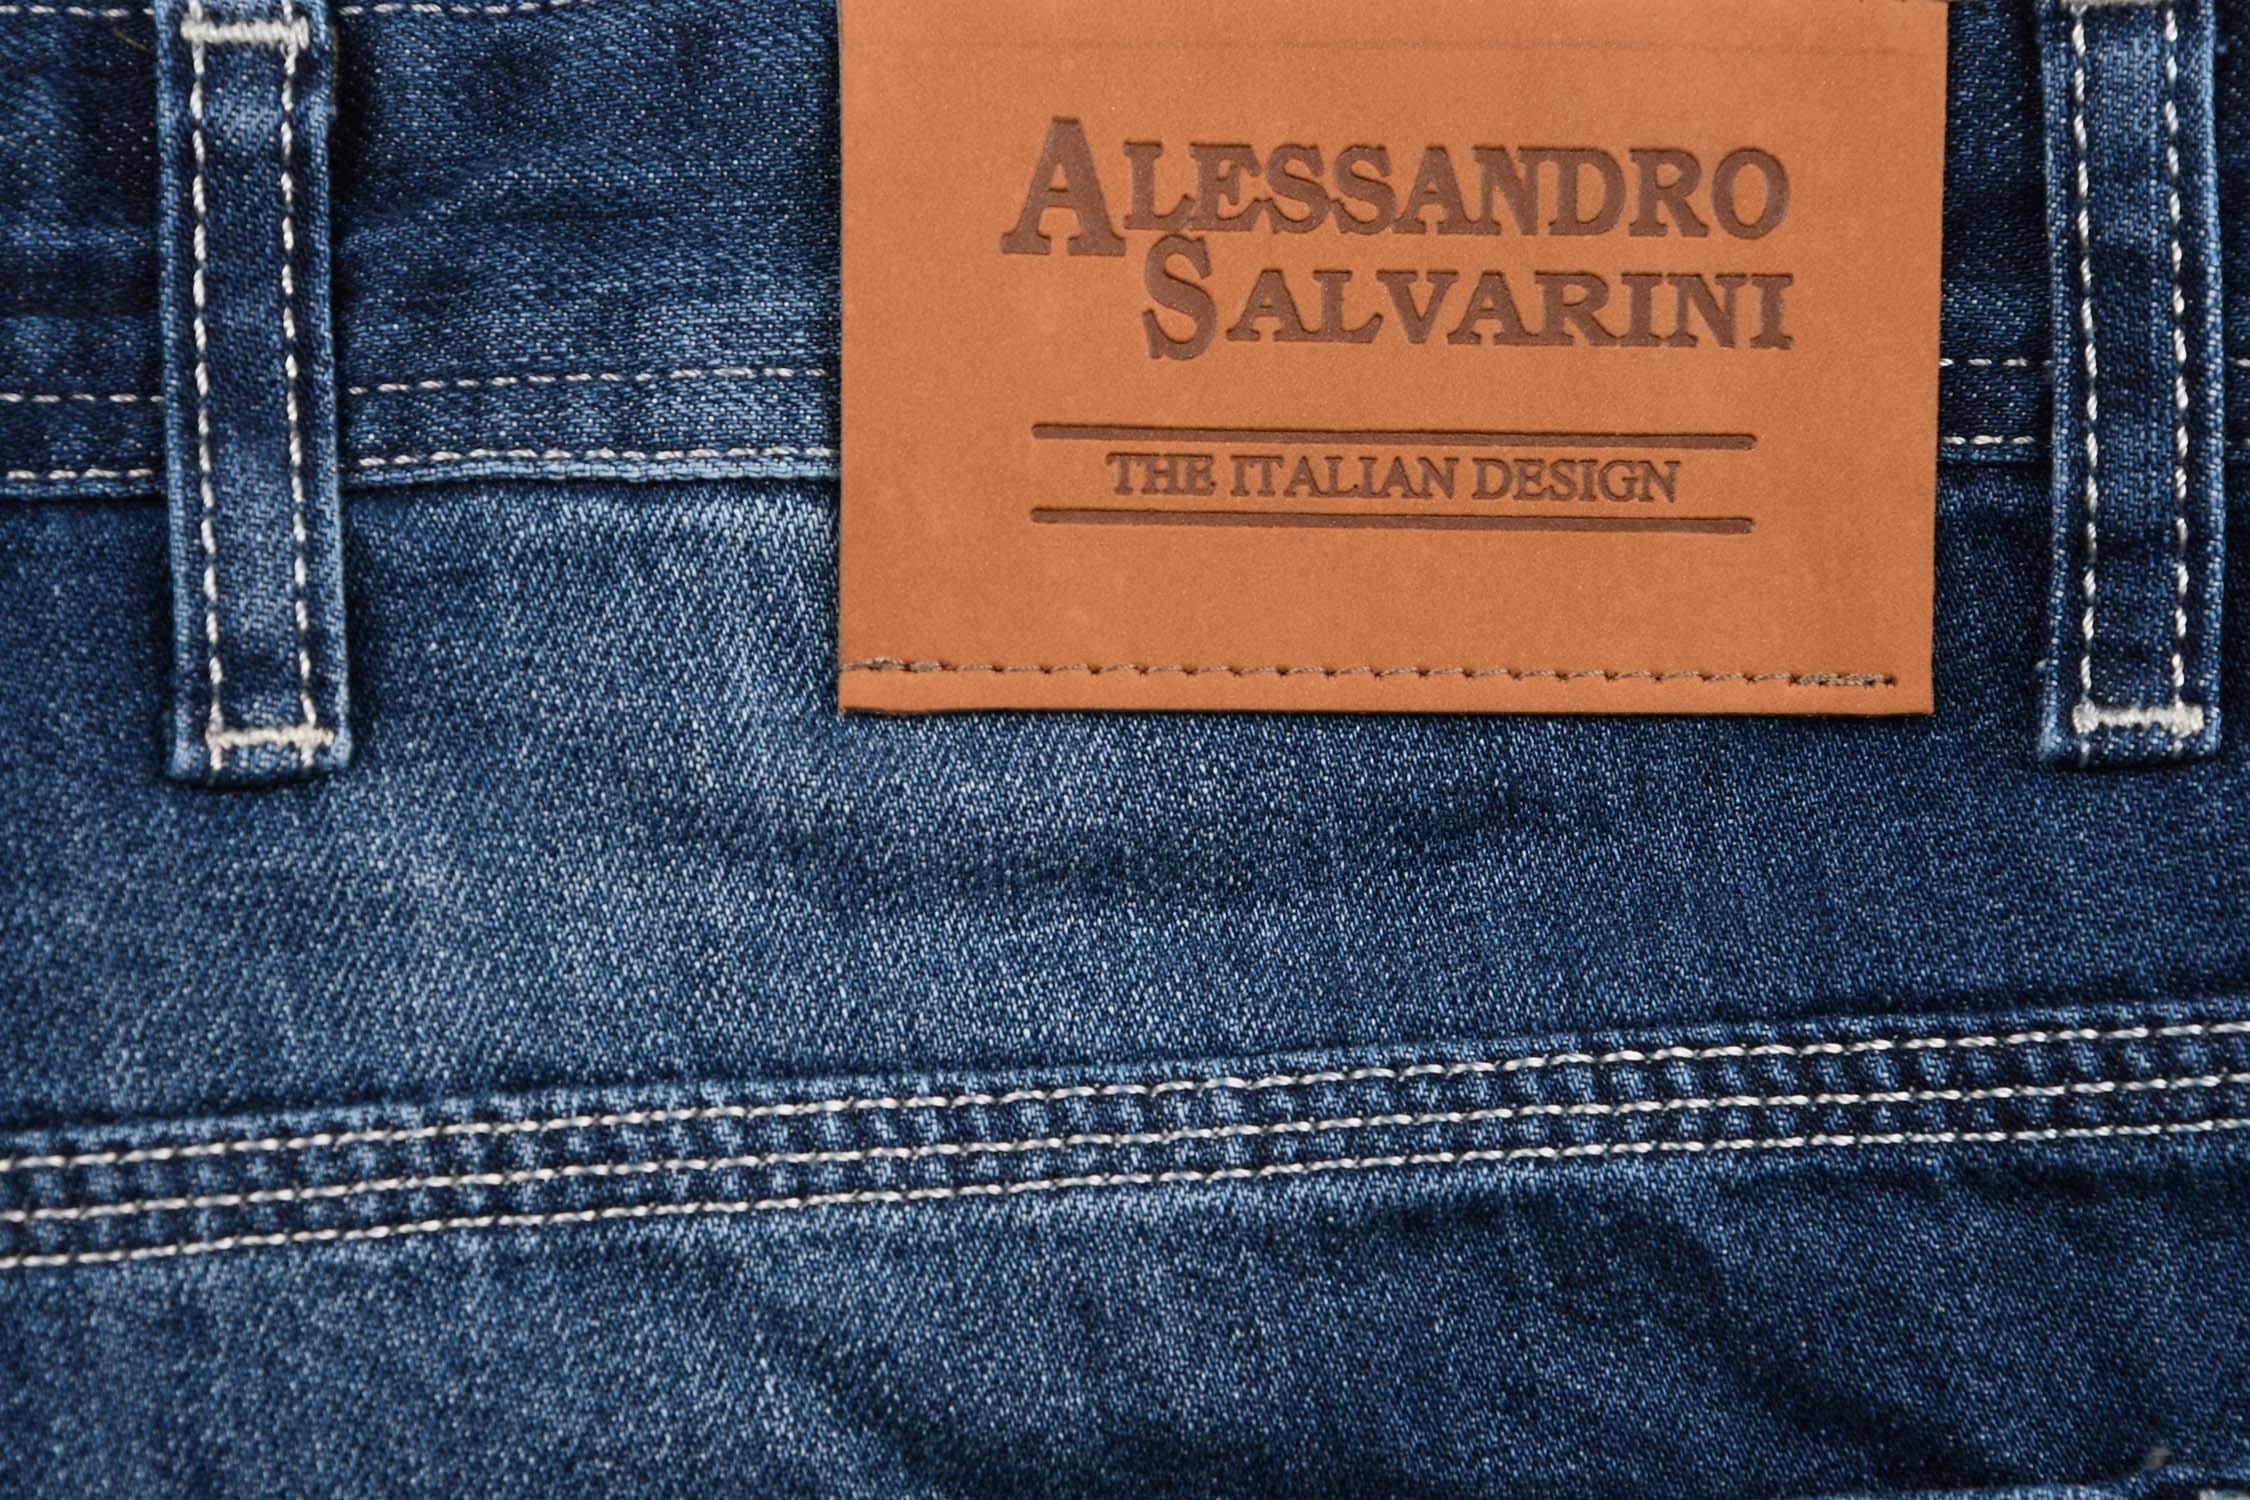 A-Salvarini-Designer-Herren-Jeans-Short-kurze-Sommer-Hose-Jeansshorts-Bermuda Indexbild 16